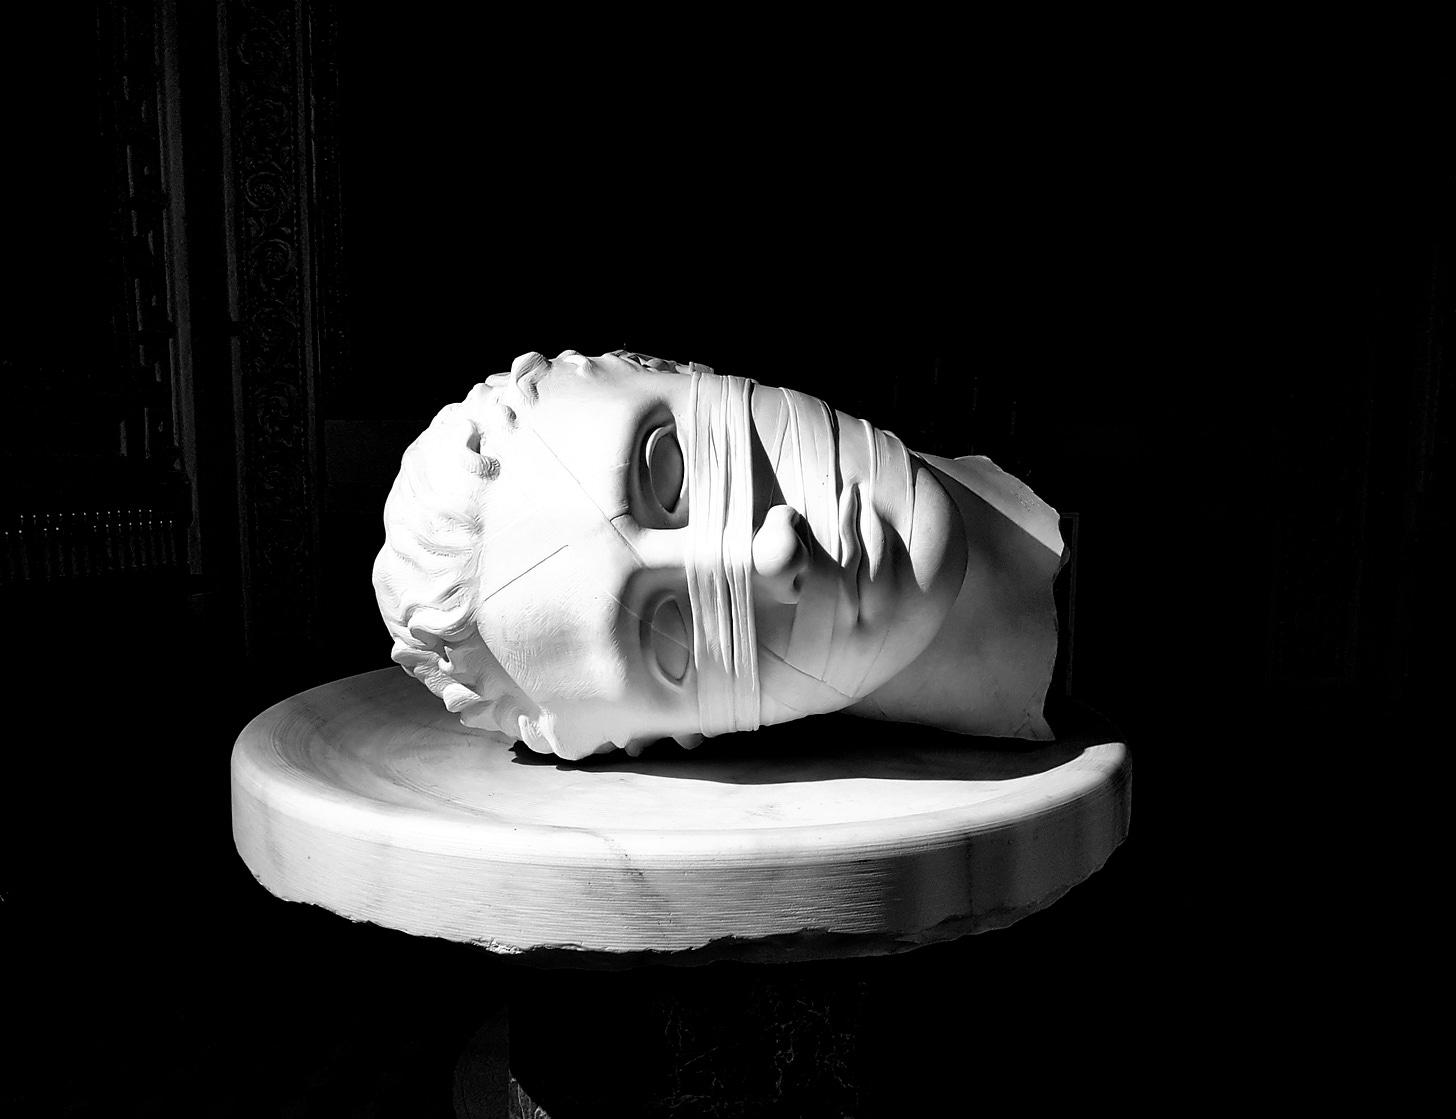 Sculpture of the bandaged, severed head of St. John the Baptist in the Santa Maria degli Angeli e dei Martiri, Baths of Diocletian, Rome.